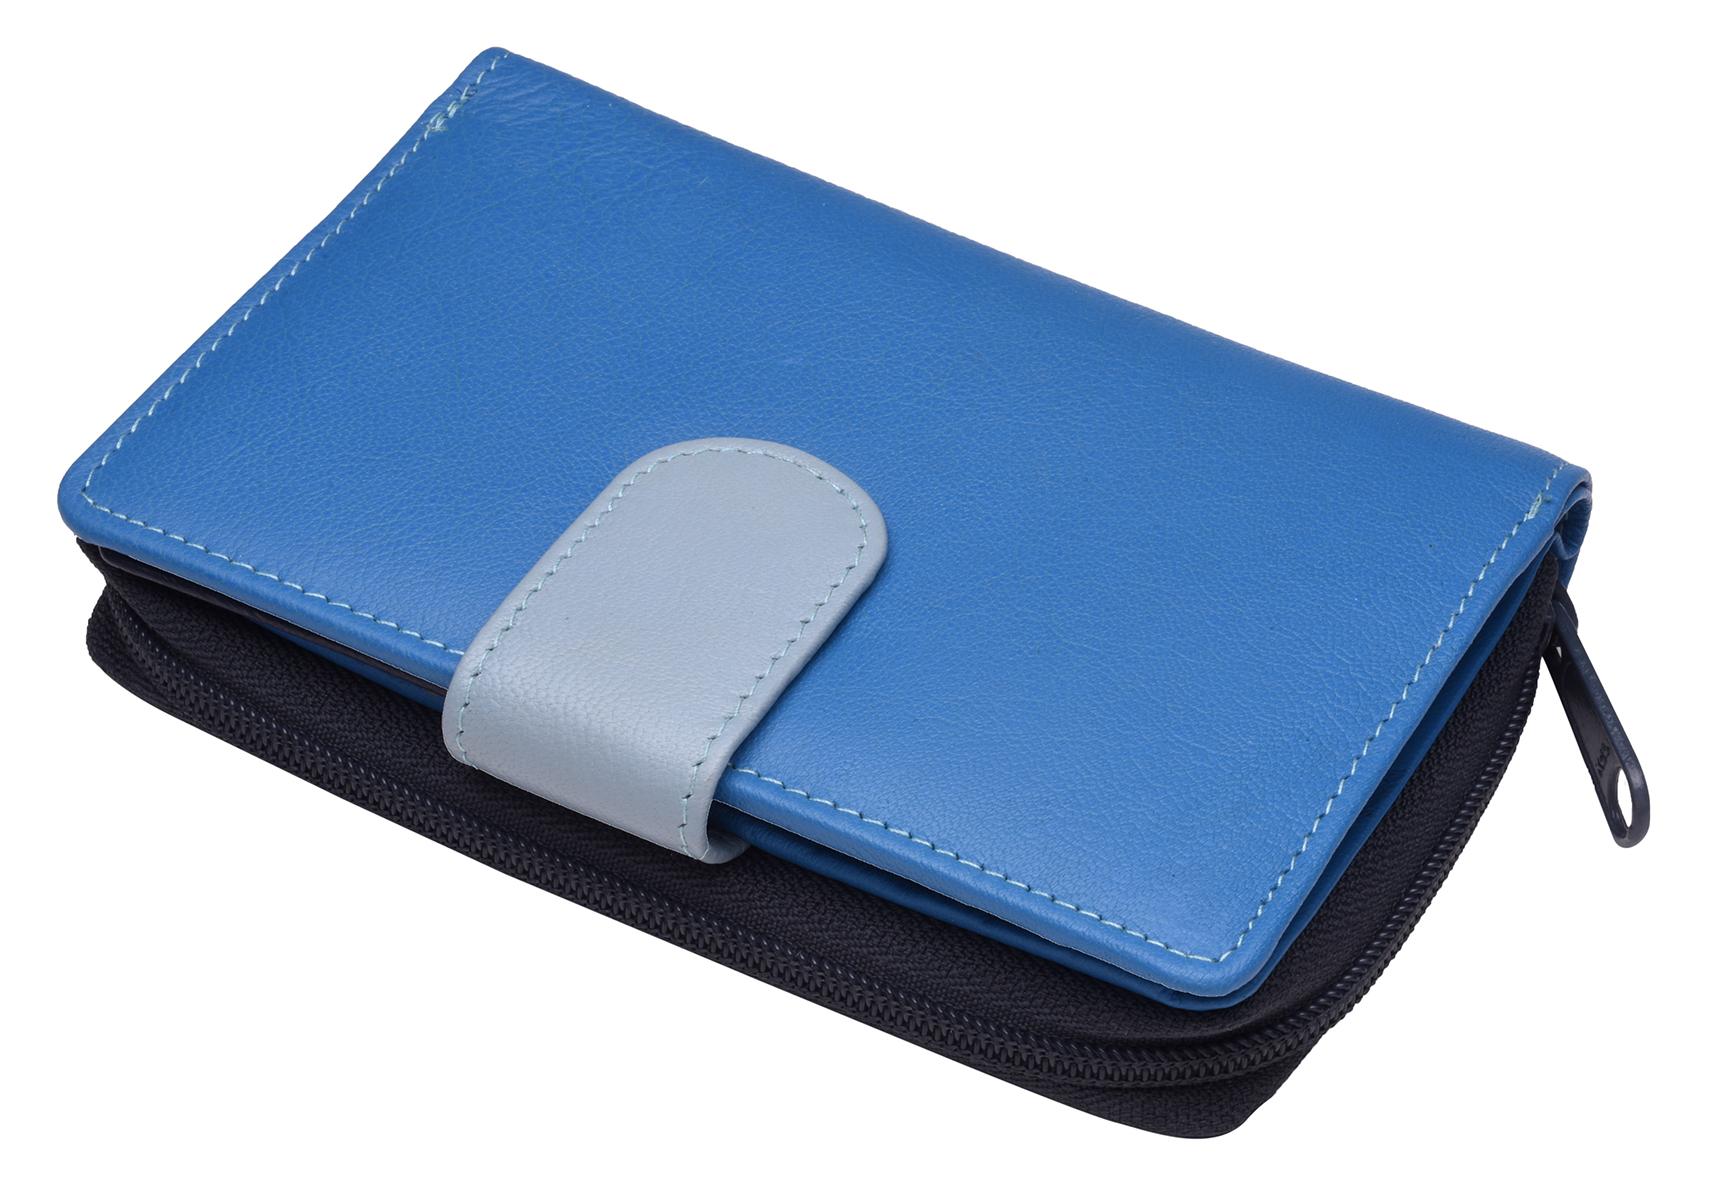 Ladies-Womens-RFID-Blocking-Safe-Leather-Bifold-Medium-Purse-Wallet-Coin-Section thumbnail 23